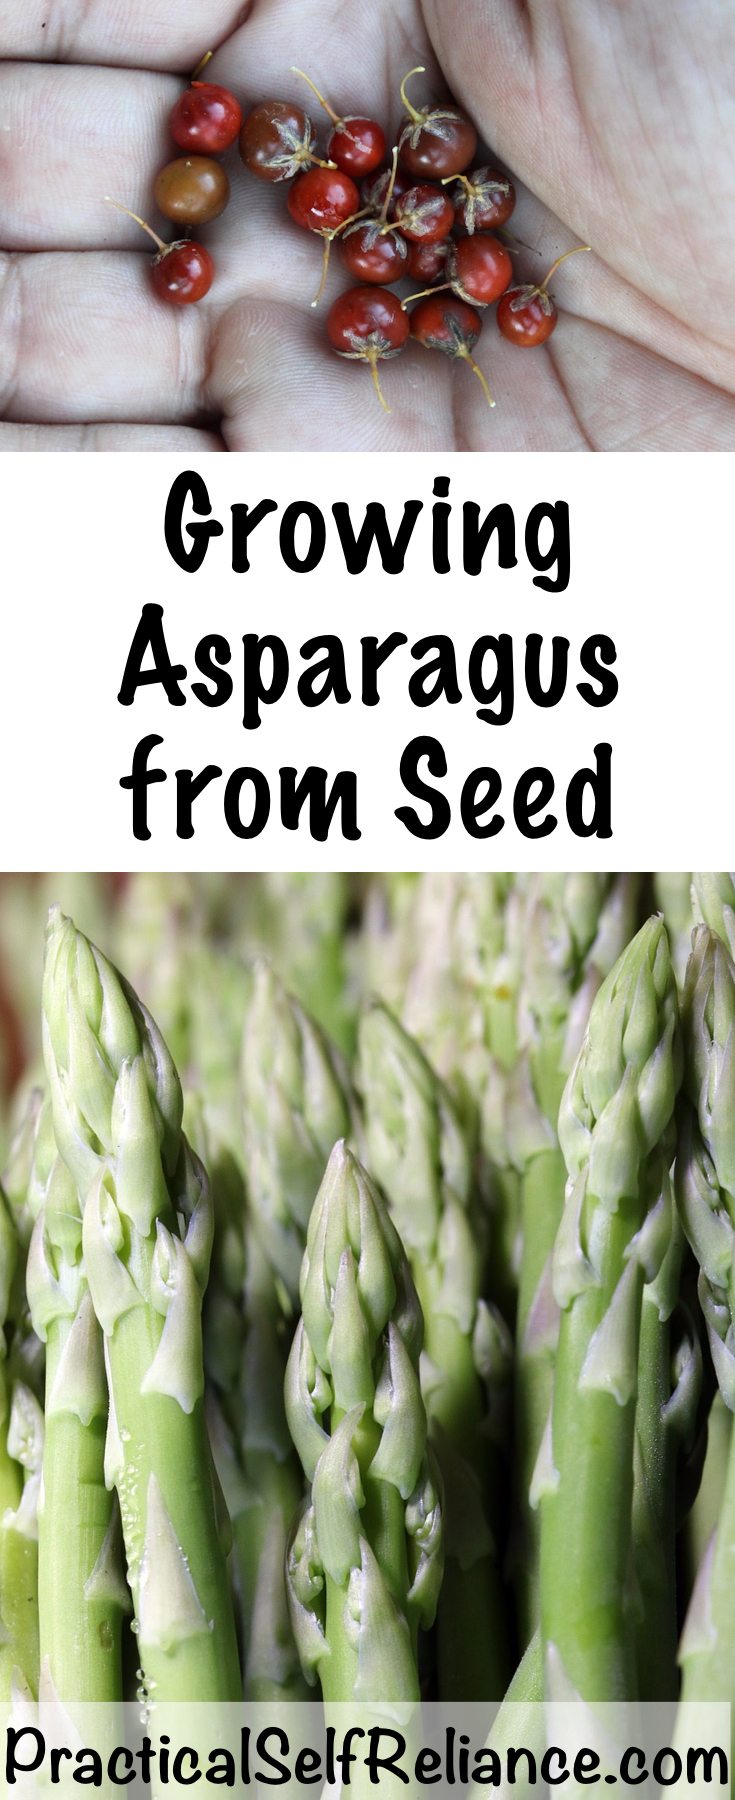 Growing Asparagus from Seed #asparagus #howtogrow #vegetablegardening #homesteading #selfreliant #growingasparagus #growingfood #foodgardening